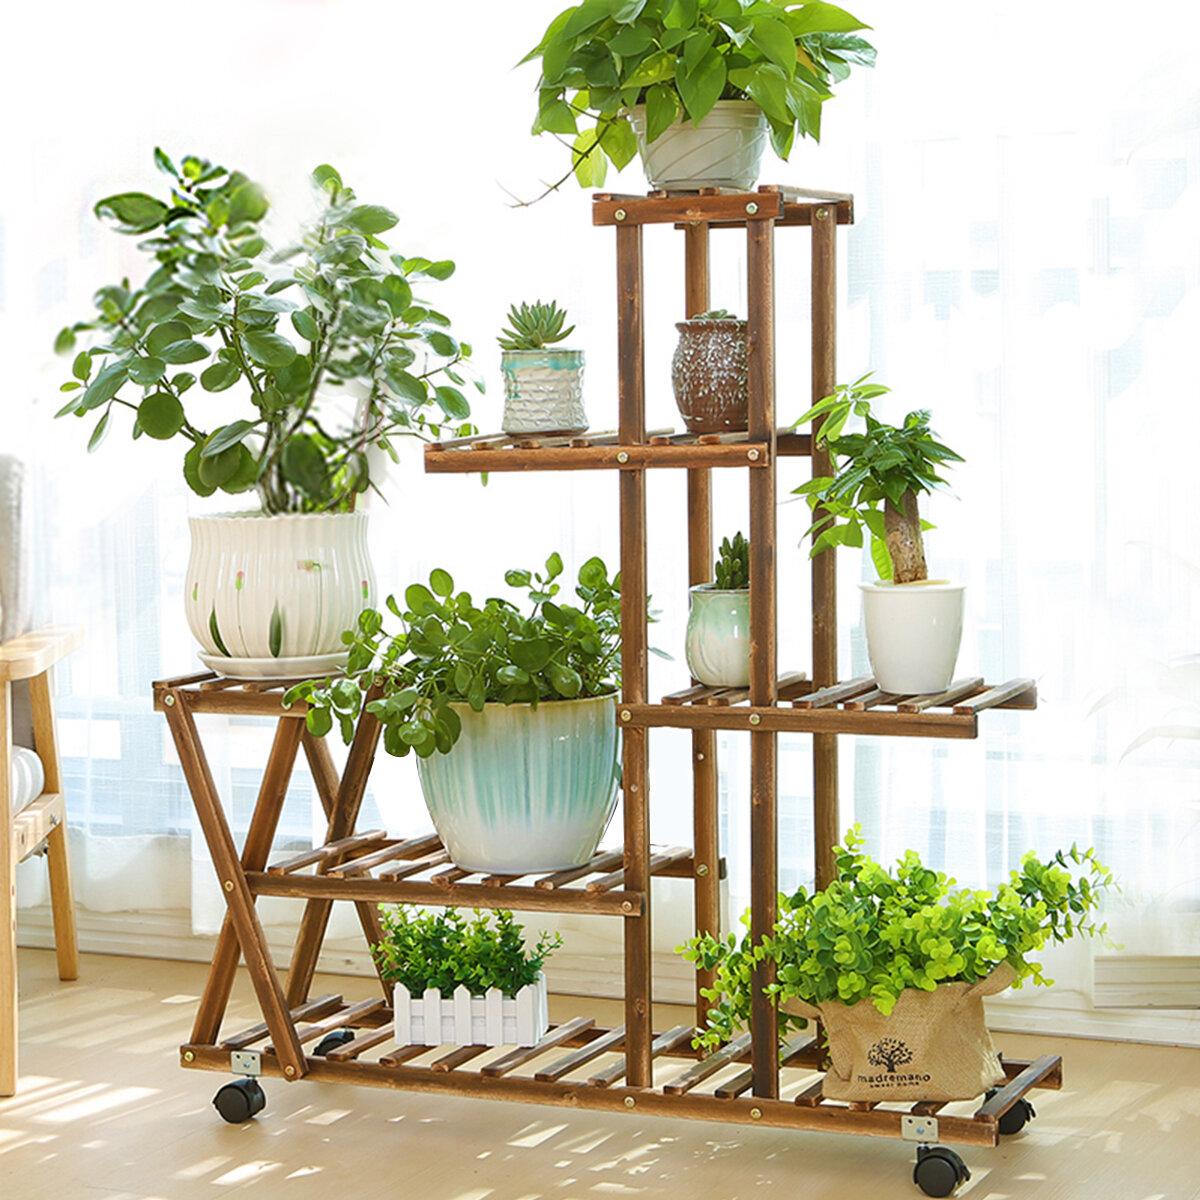 Red Barrel Studio Barbot Wooden Flower Pot Plant Stand Reviews Wayfair